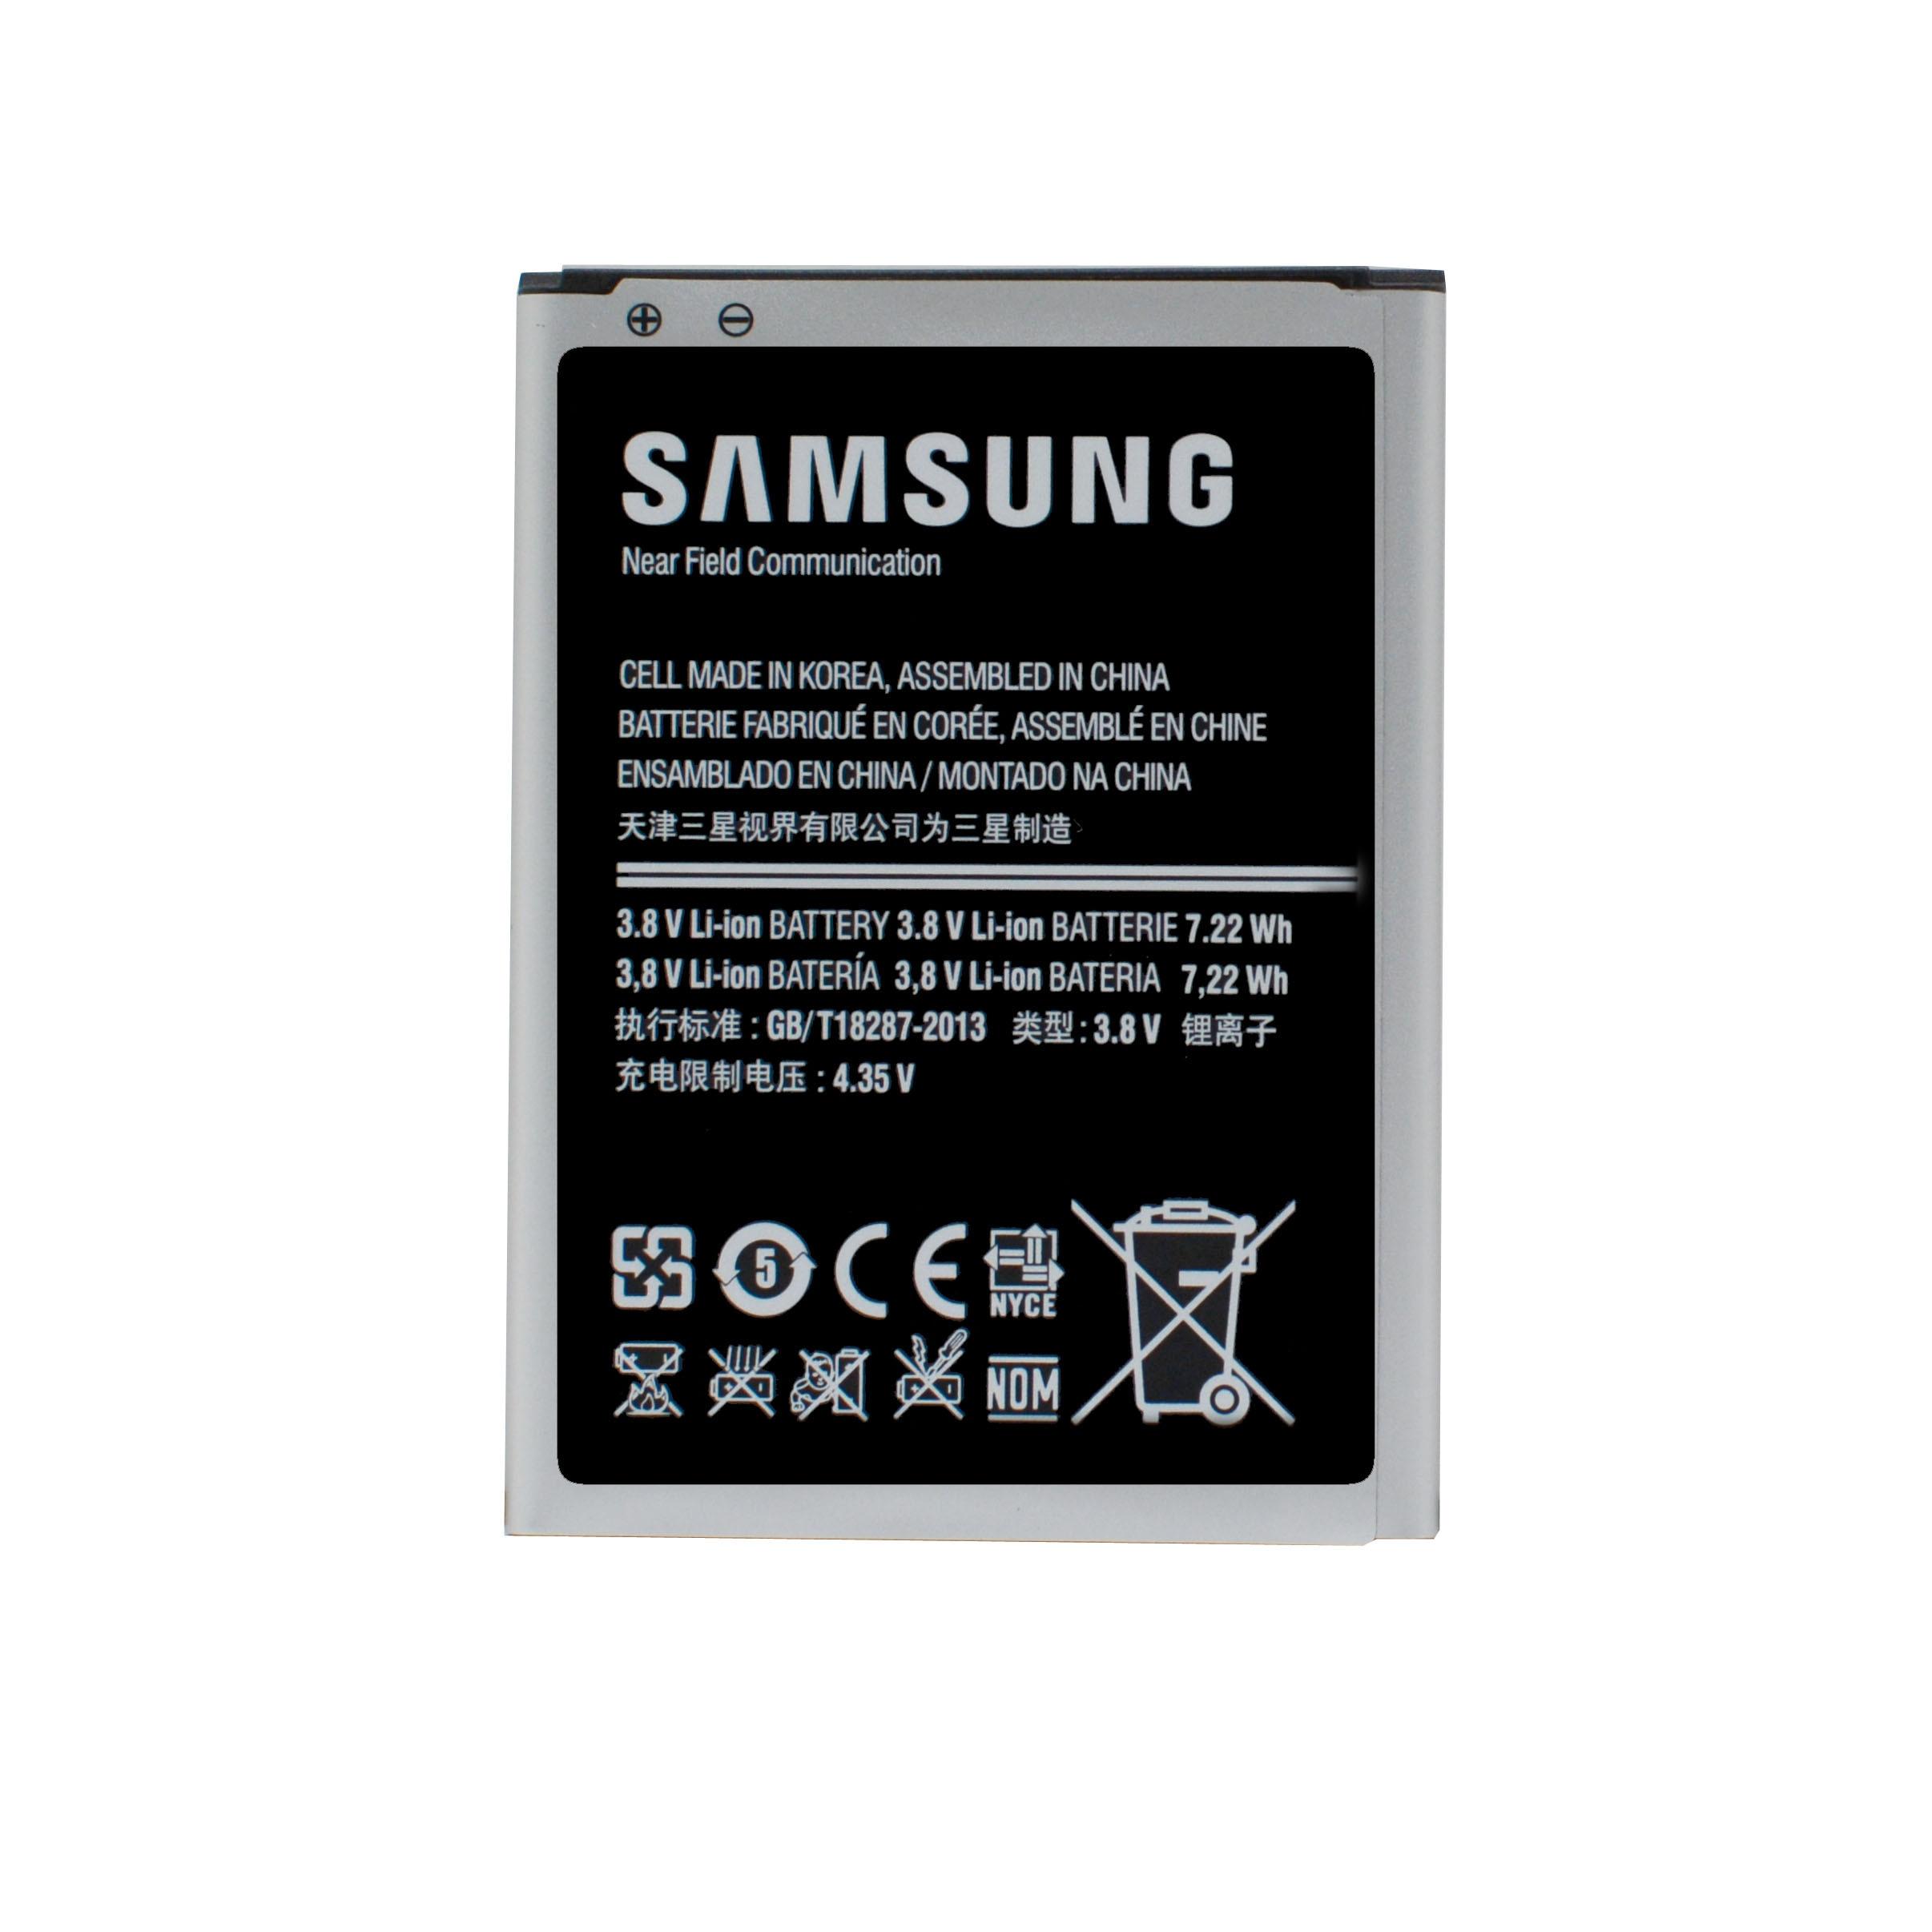 20pcs/lot Battery B500BE For Samsung Galaxy S4 Mini I9190 I9192 I9195 I9198 NFC Original phone batteria AKKU 1900mAh enlarge